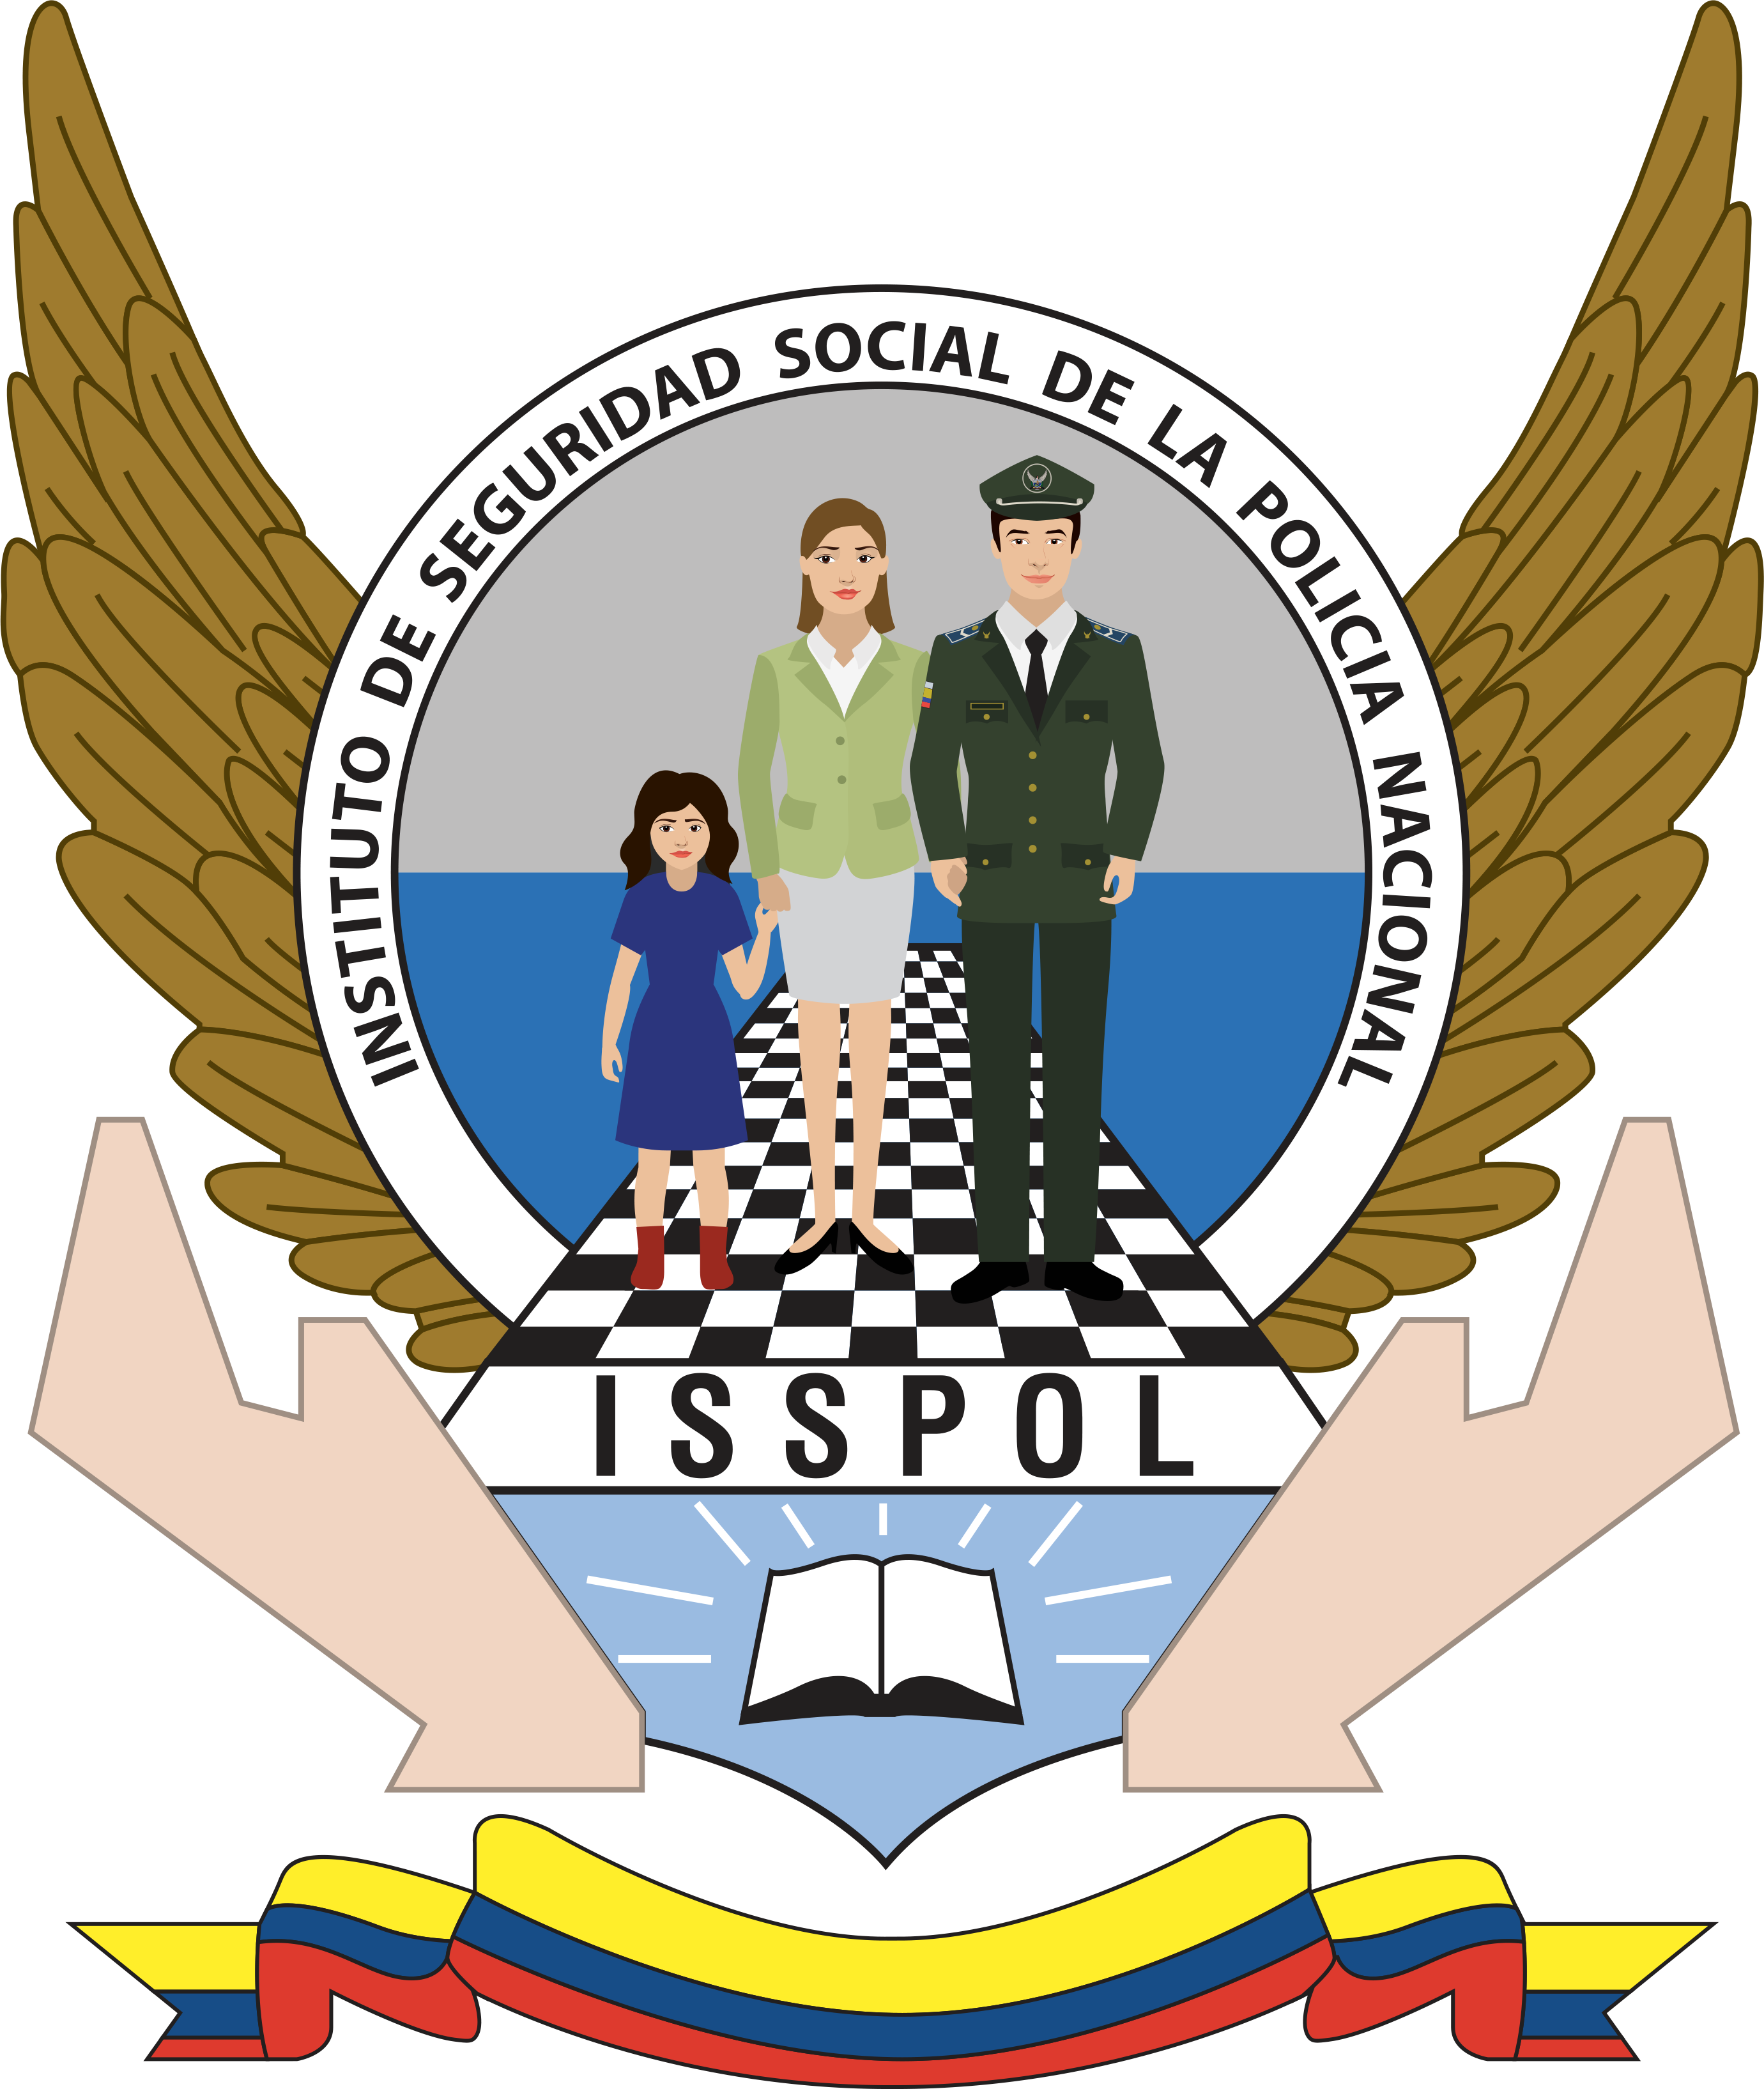 ISSPOL